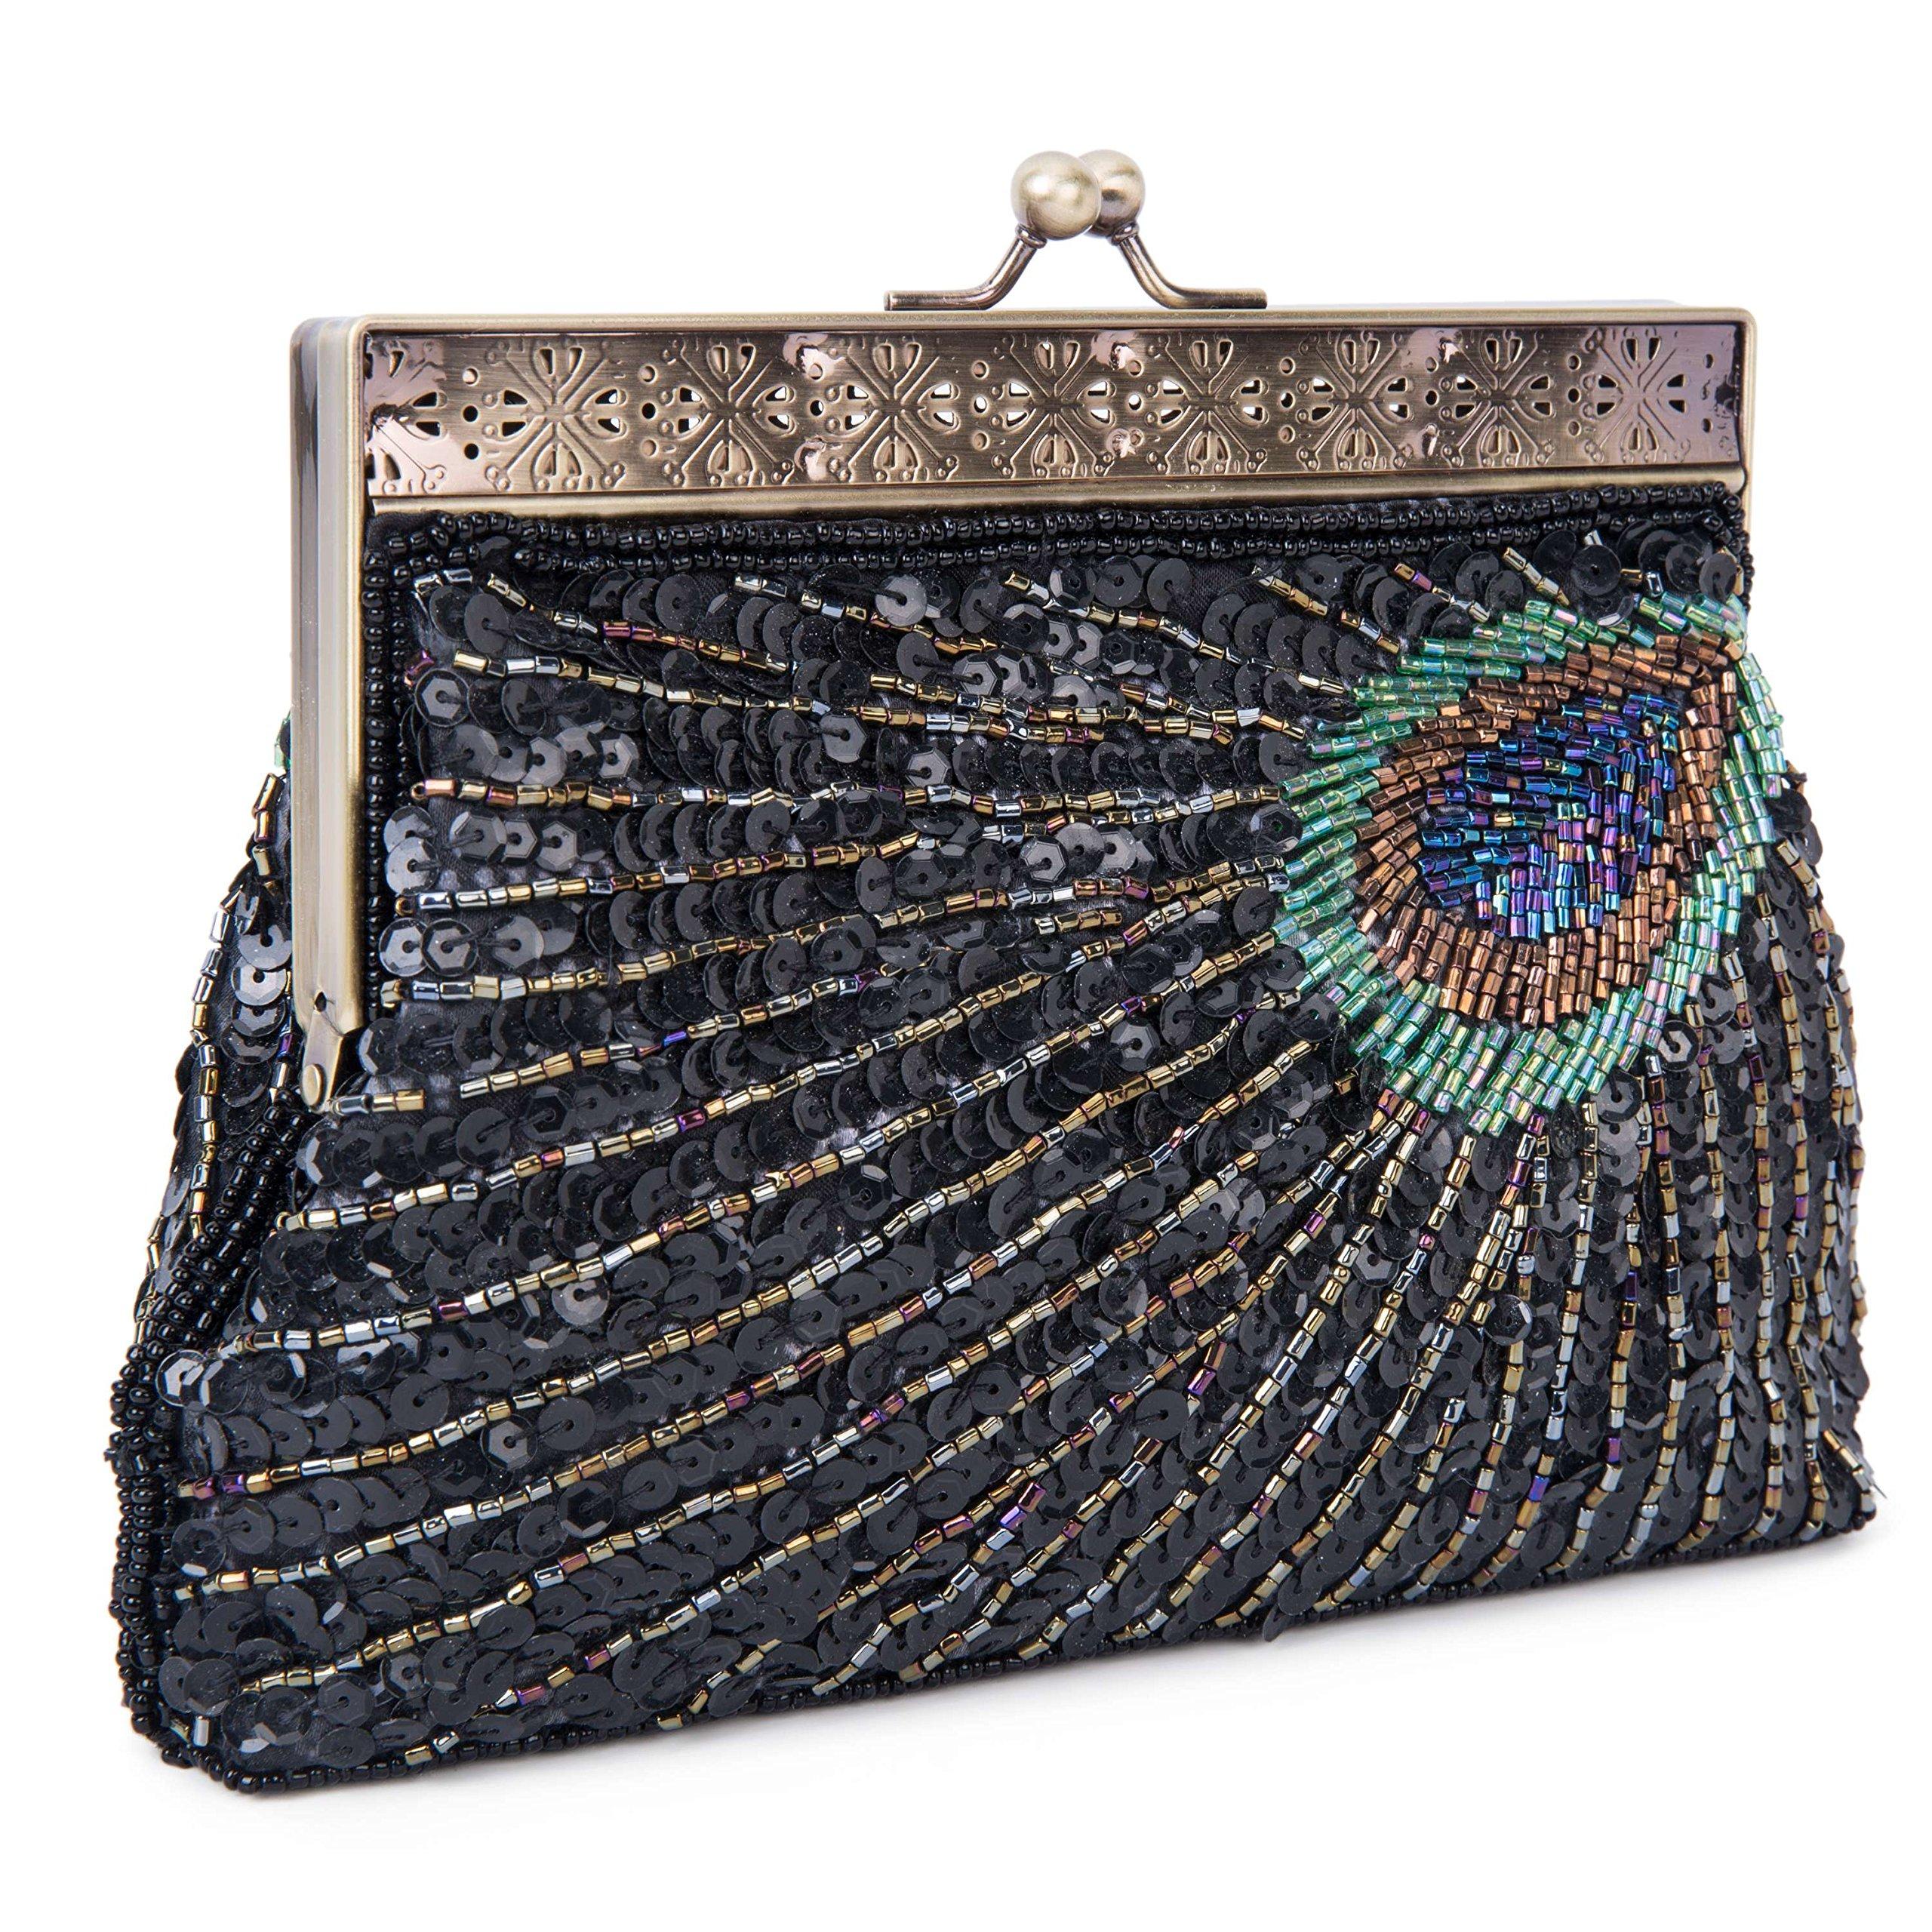 UBORSE Beaded Sequin Peacock Evening Clutch Bags Party Wedding Purse Black